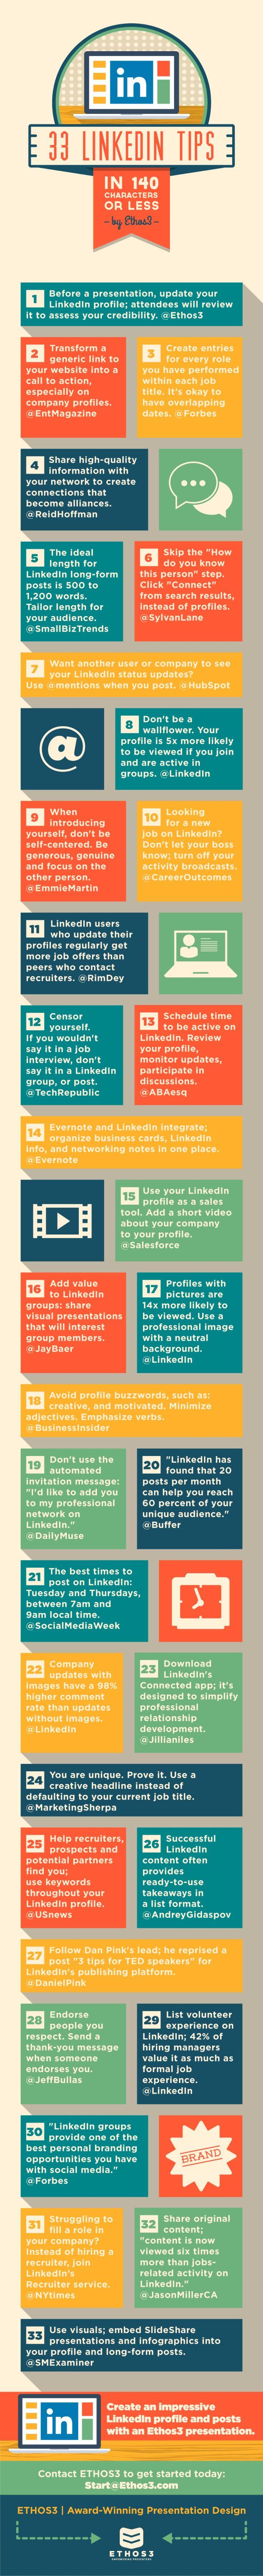 33 Tweetable LinkedIn Tips [Infographic], via @HubSpot